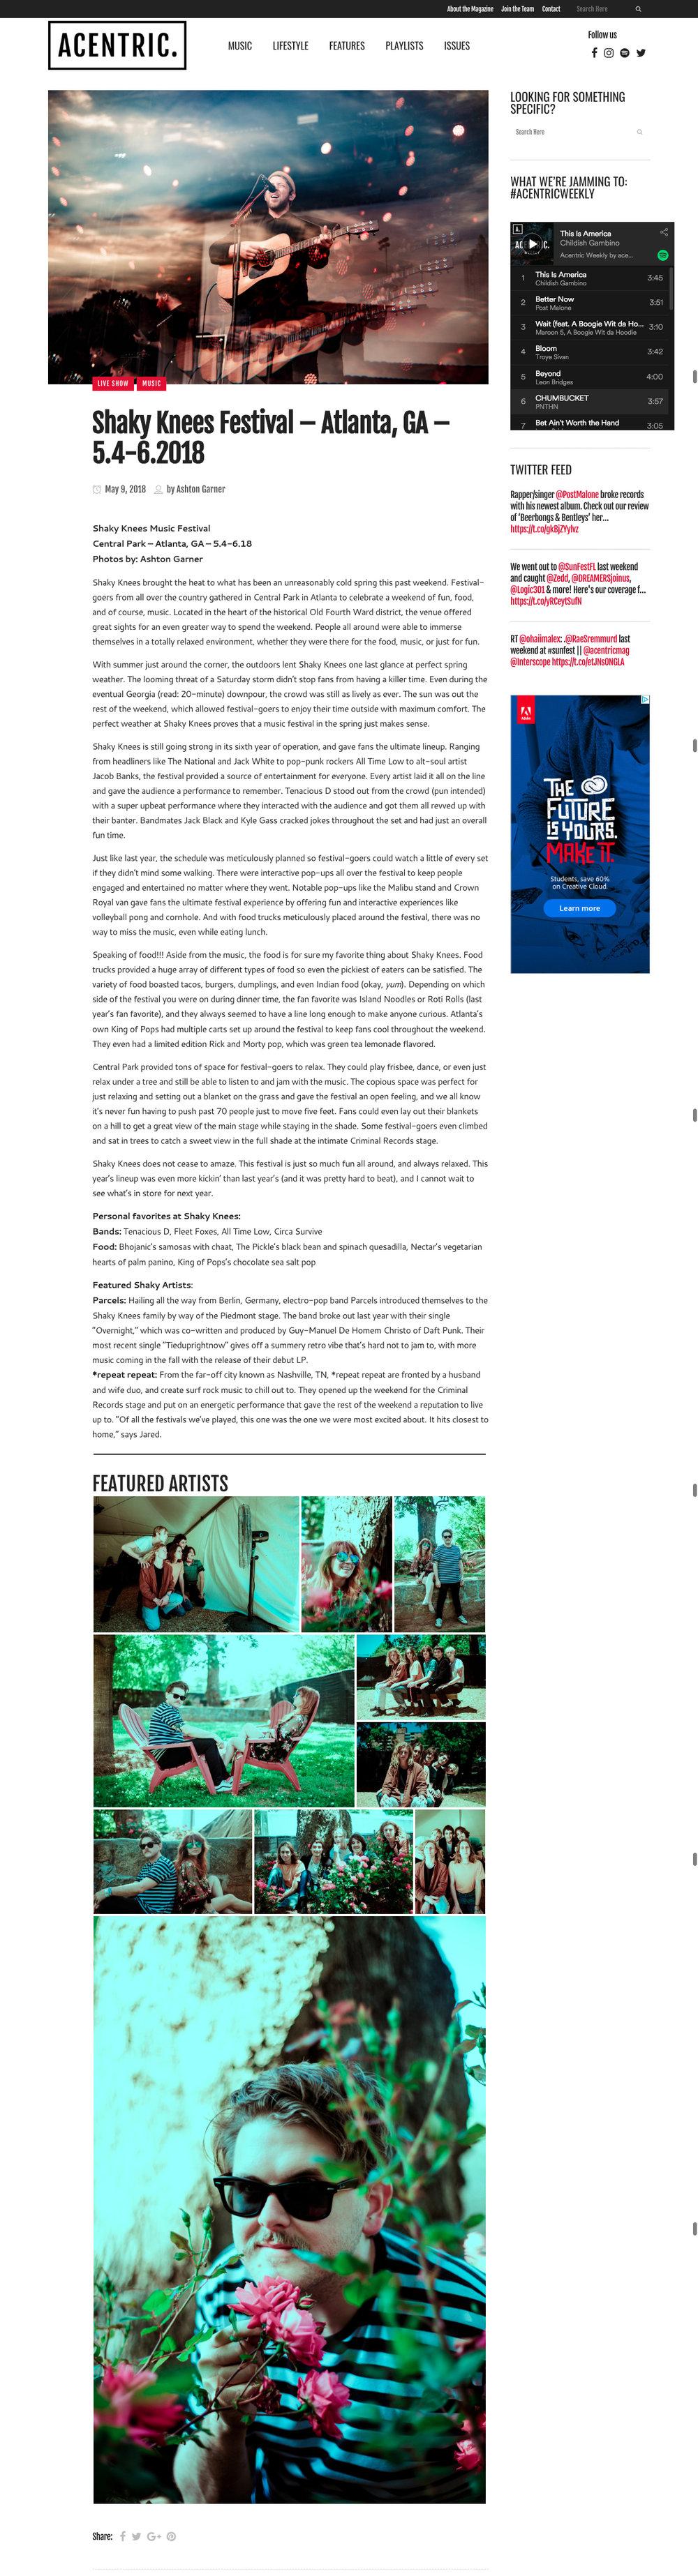 Acentric Magazine Shaky Knees 2018.jpg